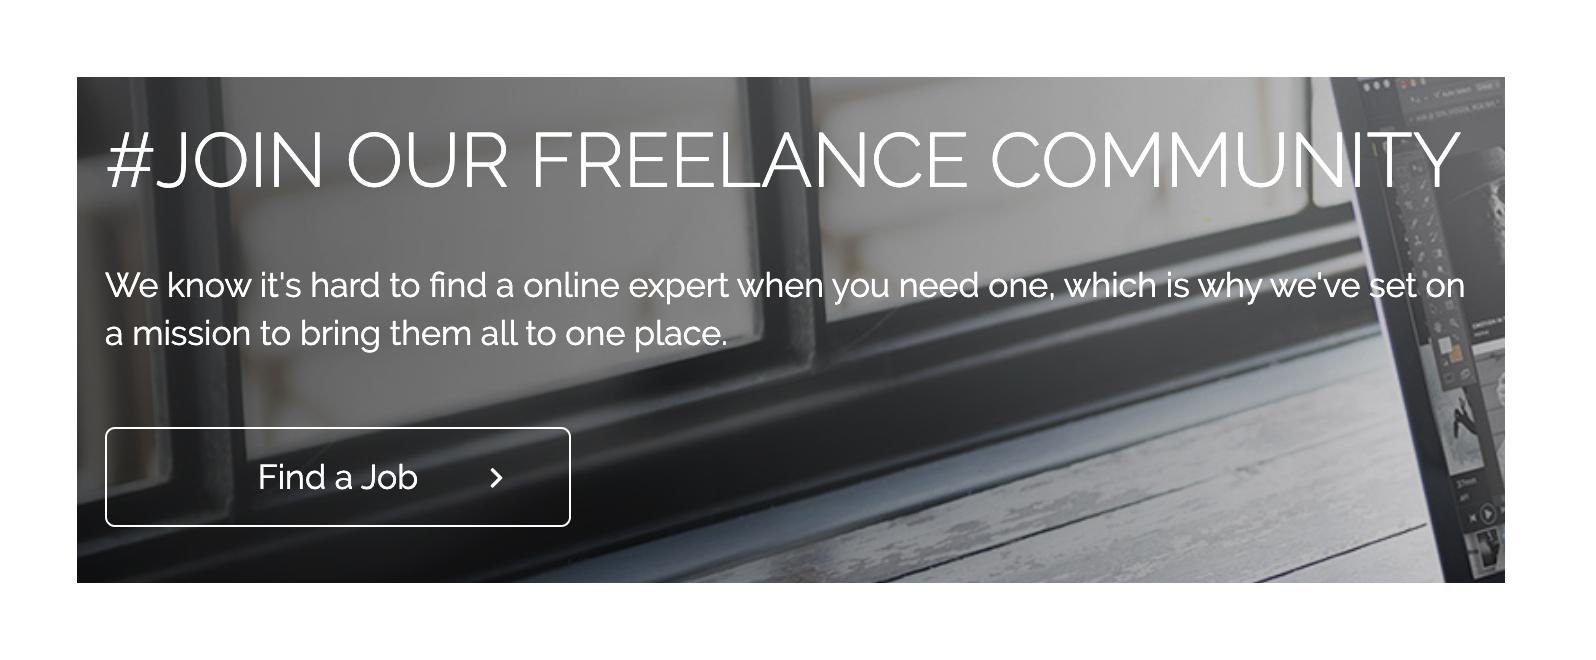 Building and Customizing WPFreelance Theme - Customize banner